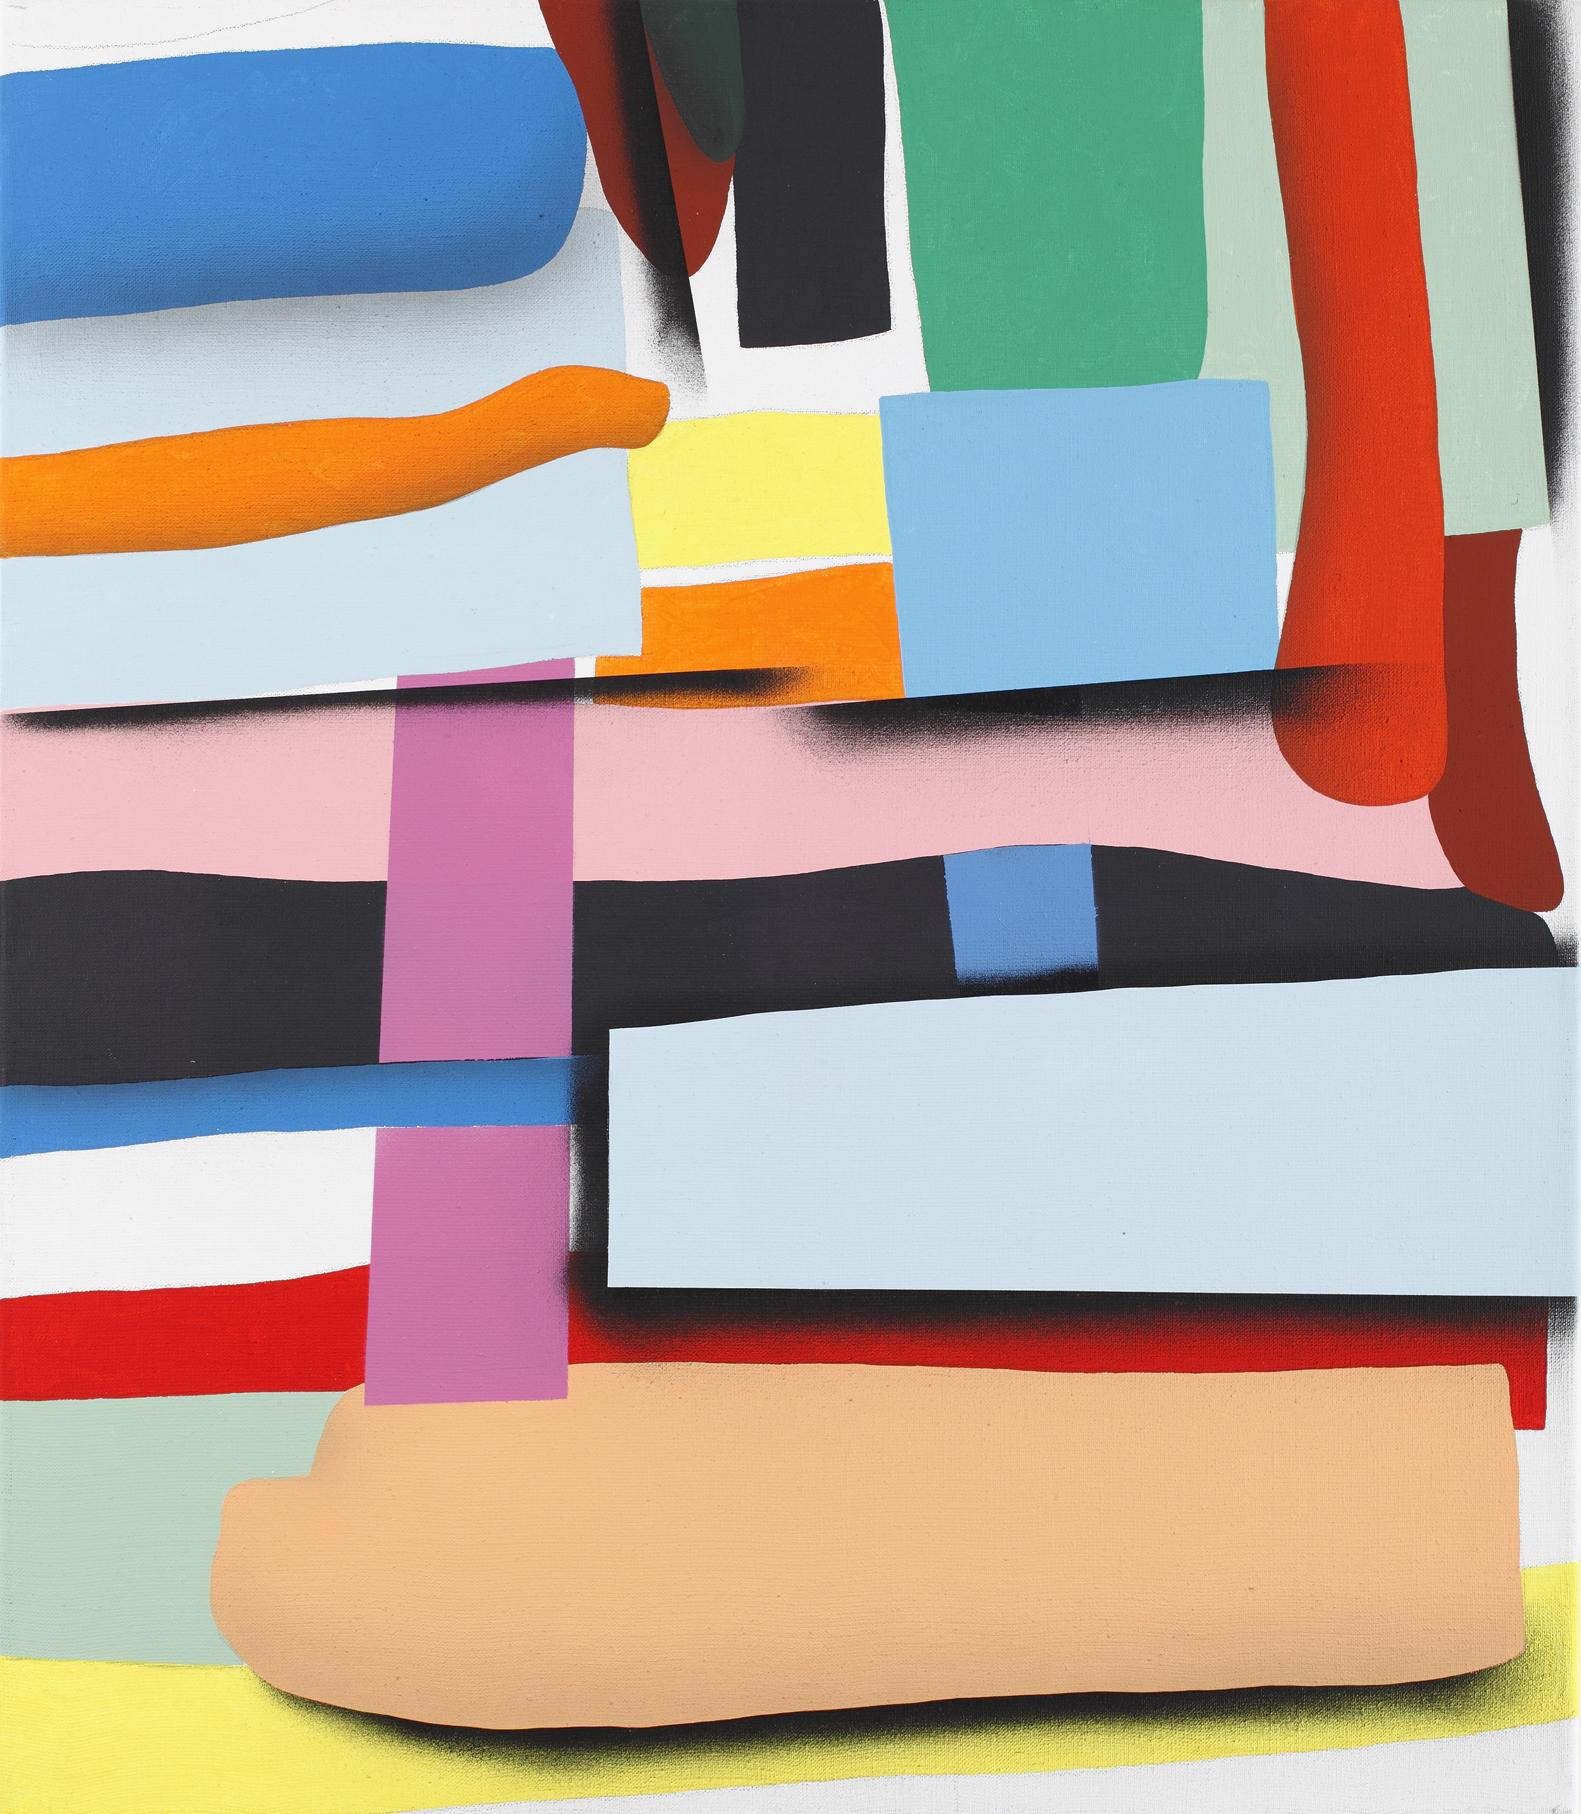 Neomondrians, Zoom No. 1, 2012, acrylic, spray on canvas, 75 x 65 cm